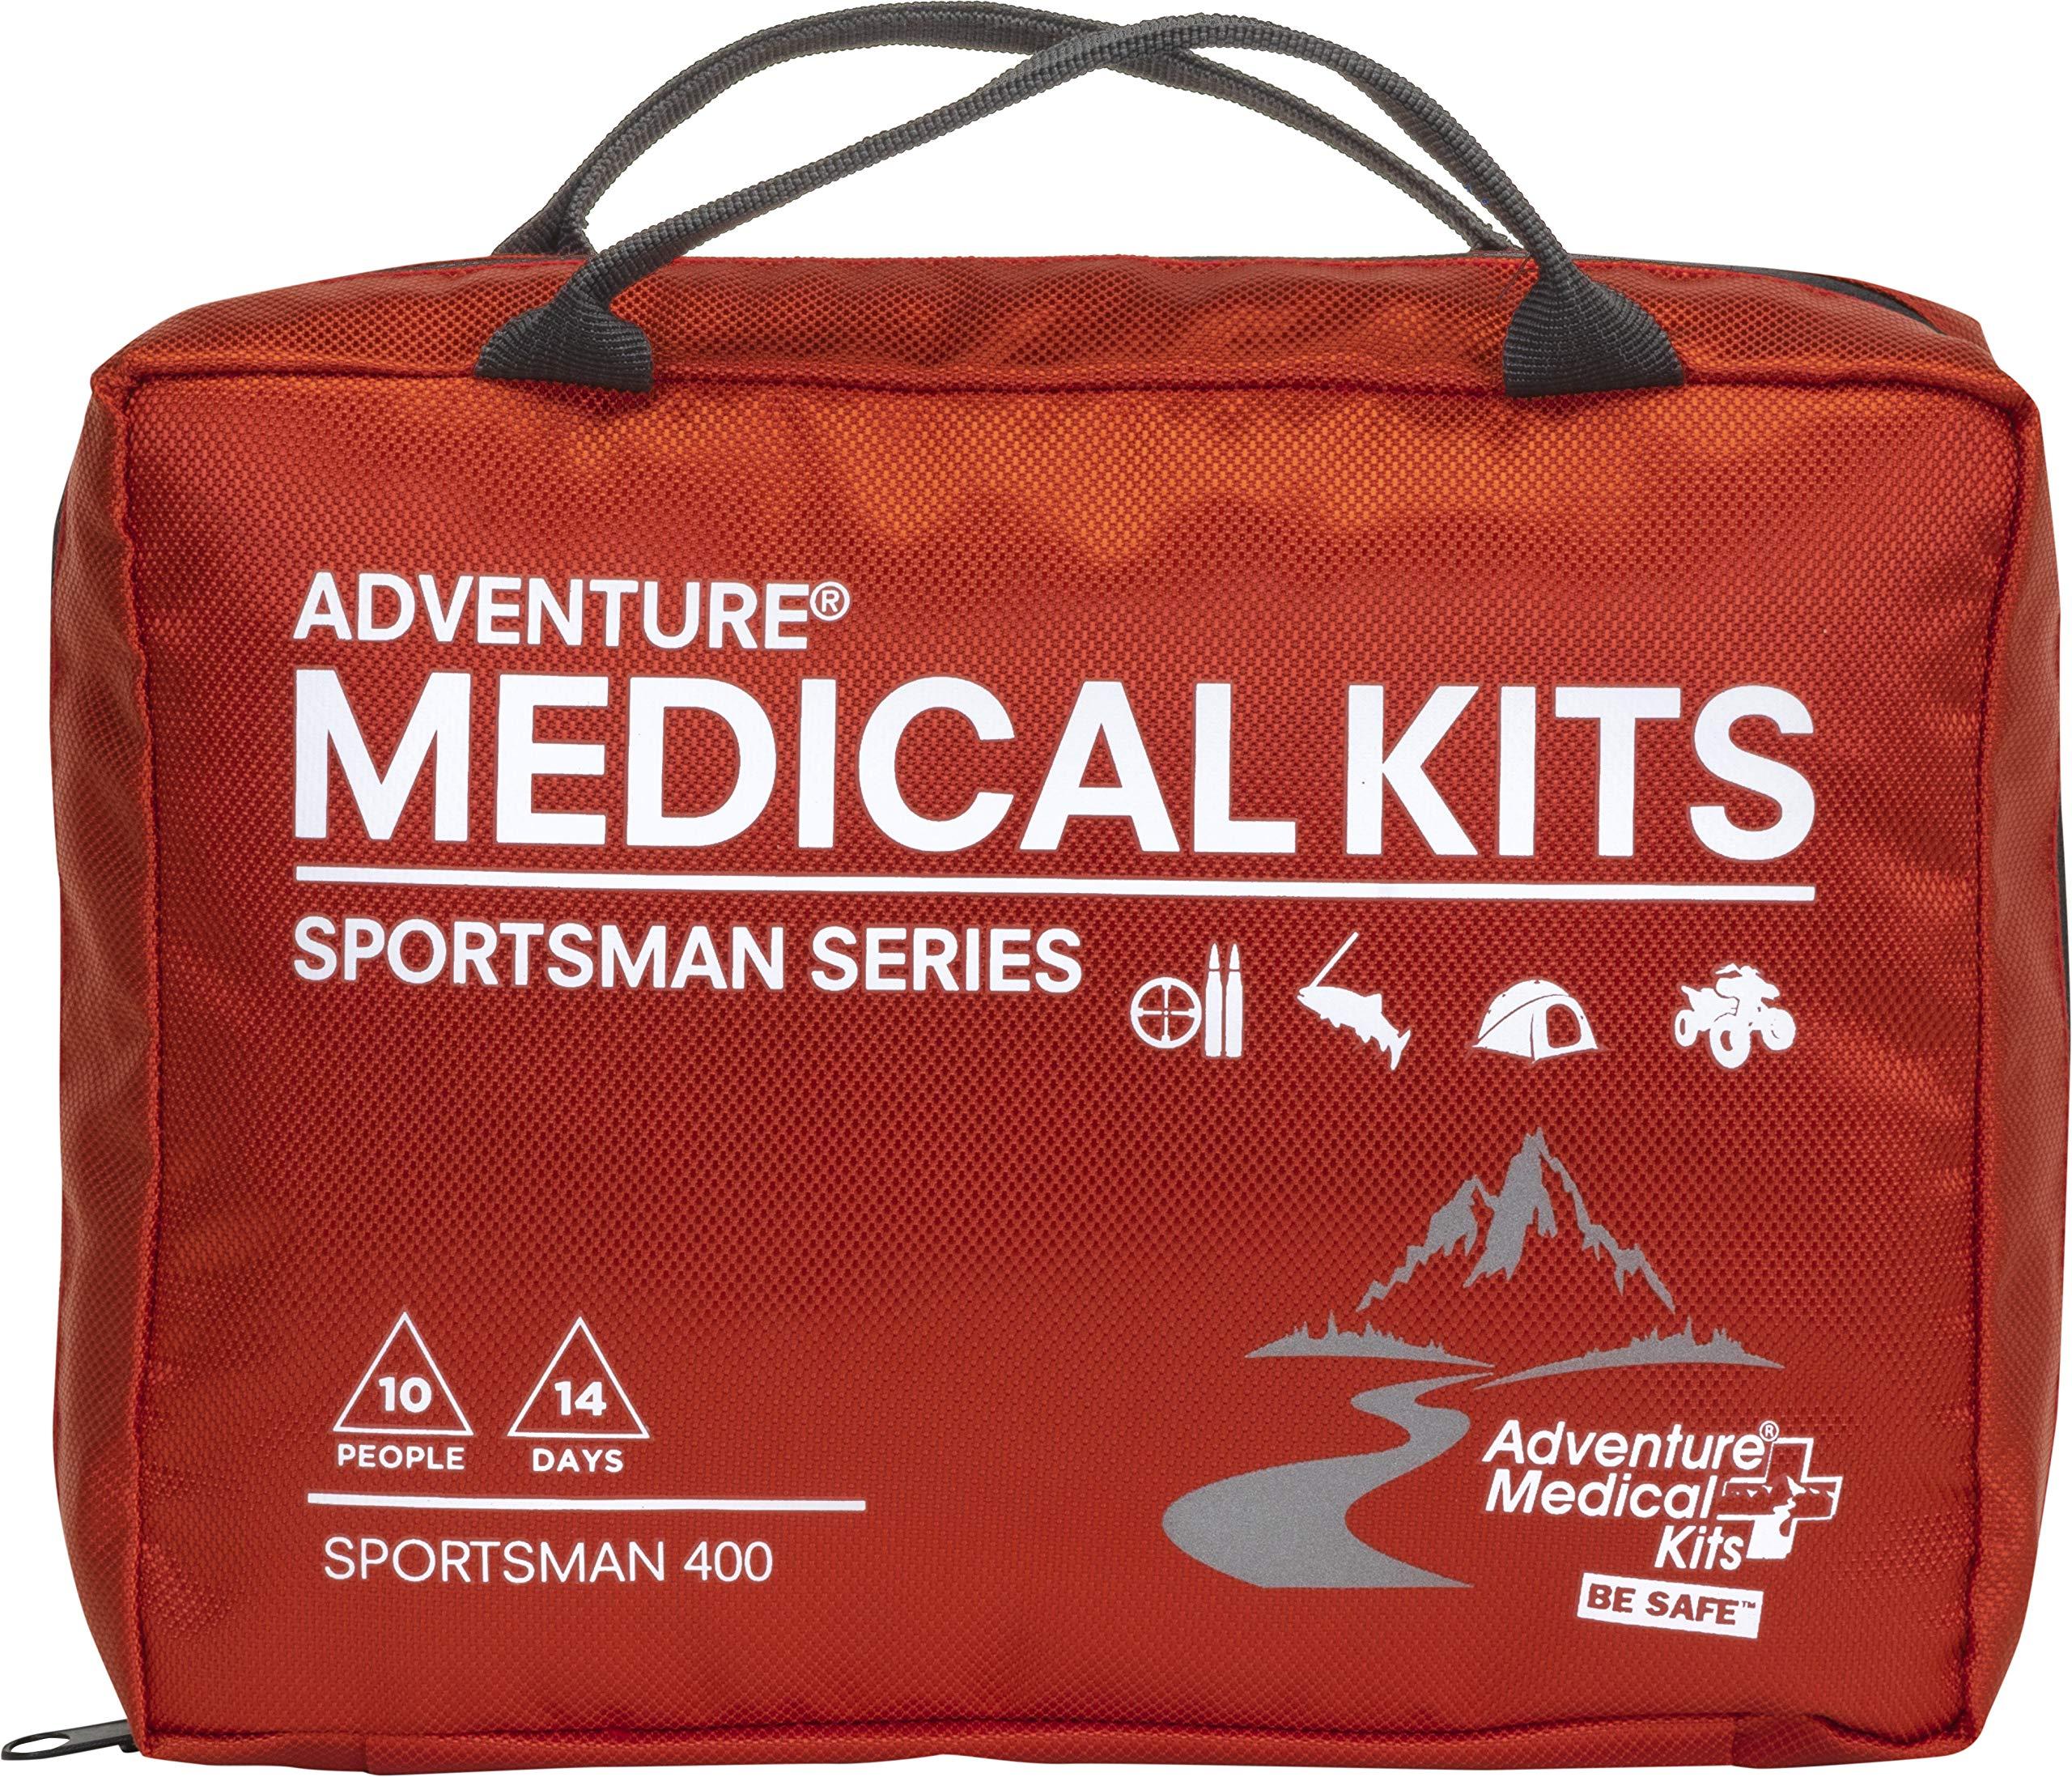 Adventure Medical Kits Sportsman Series 400 Outdoor First Aid Kit by Adventure Medical Kits